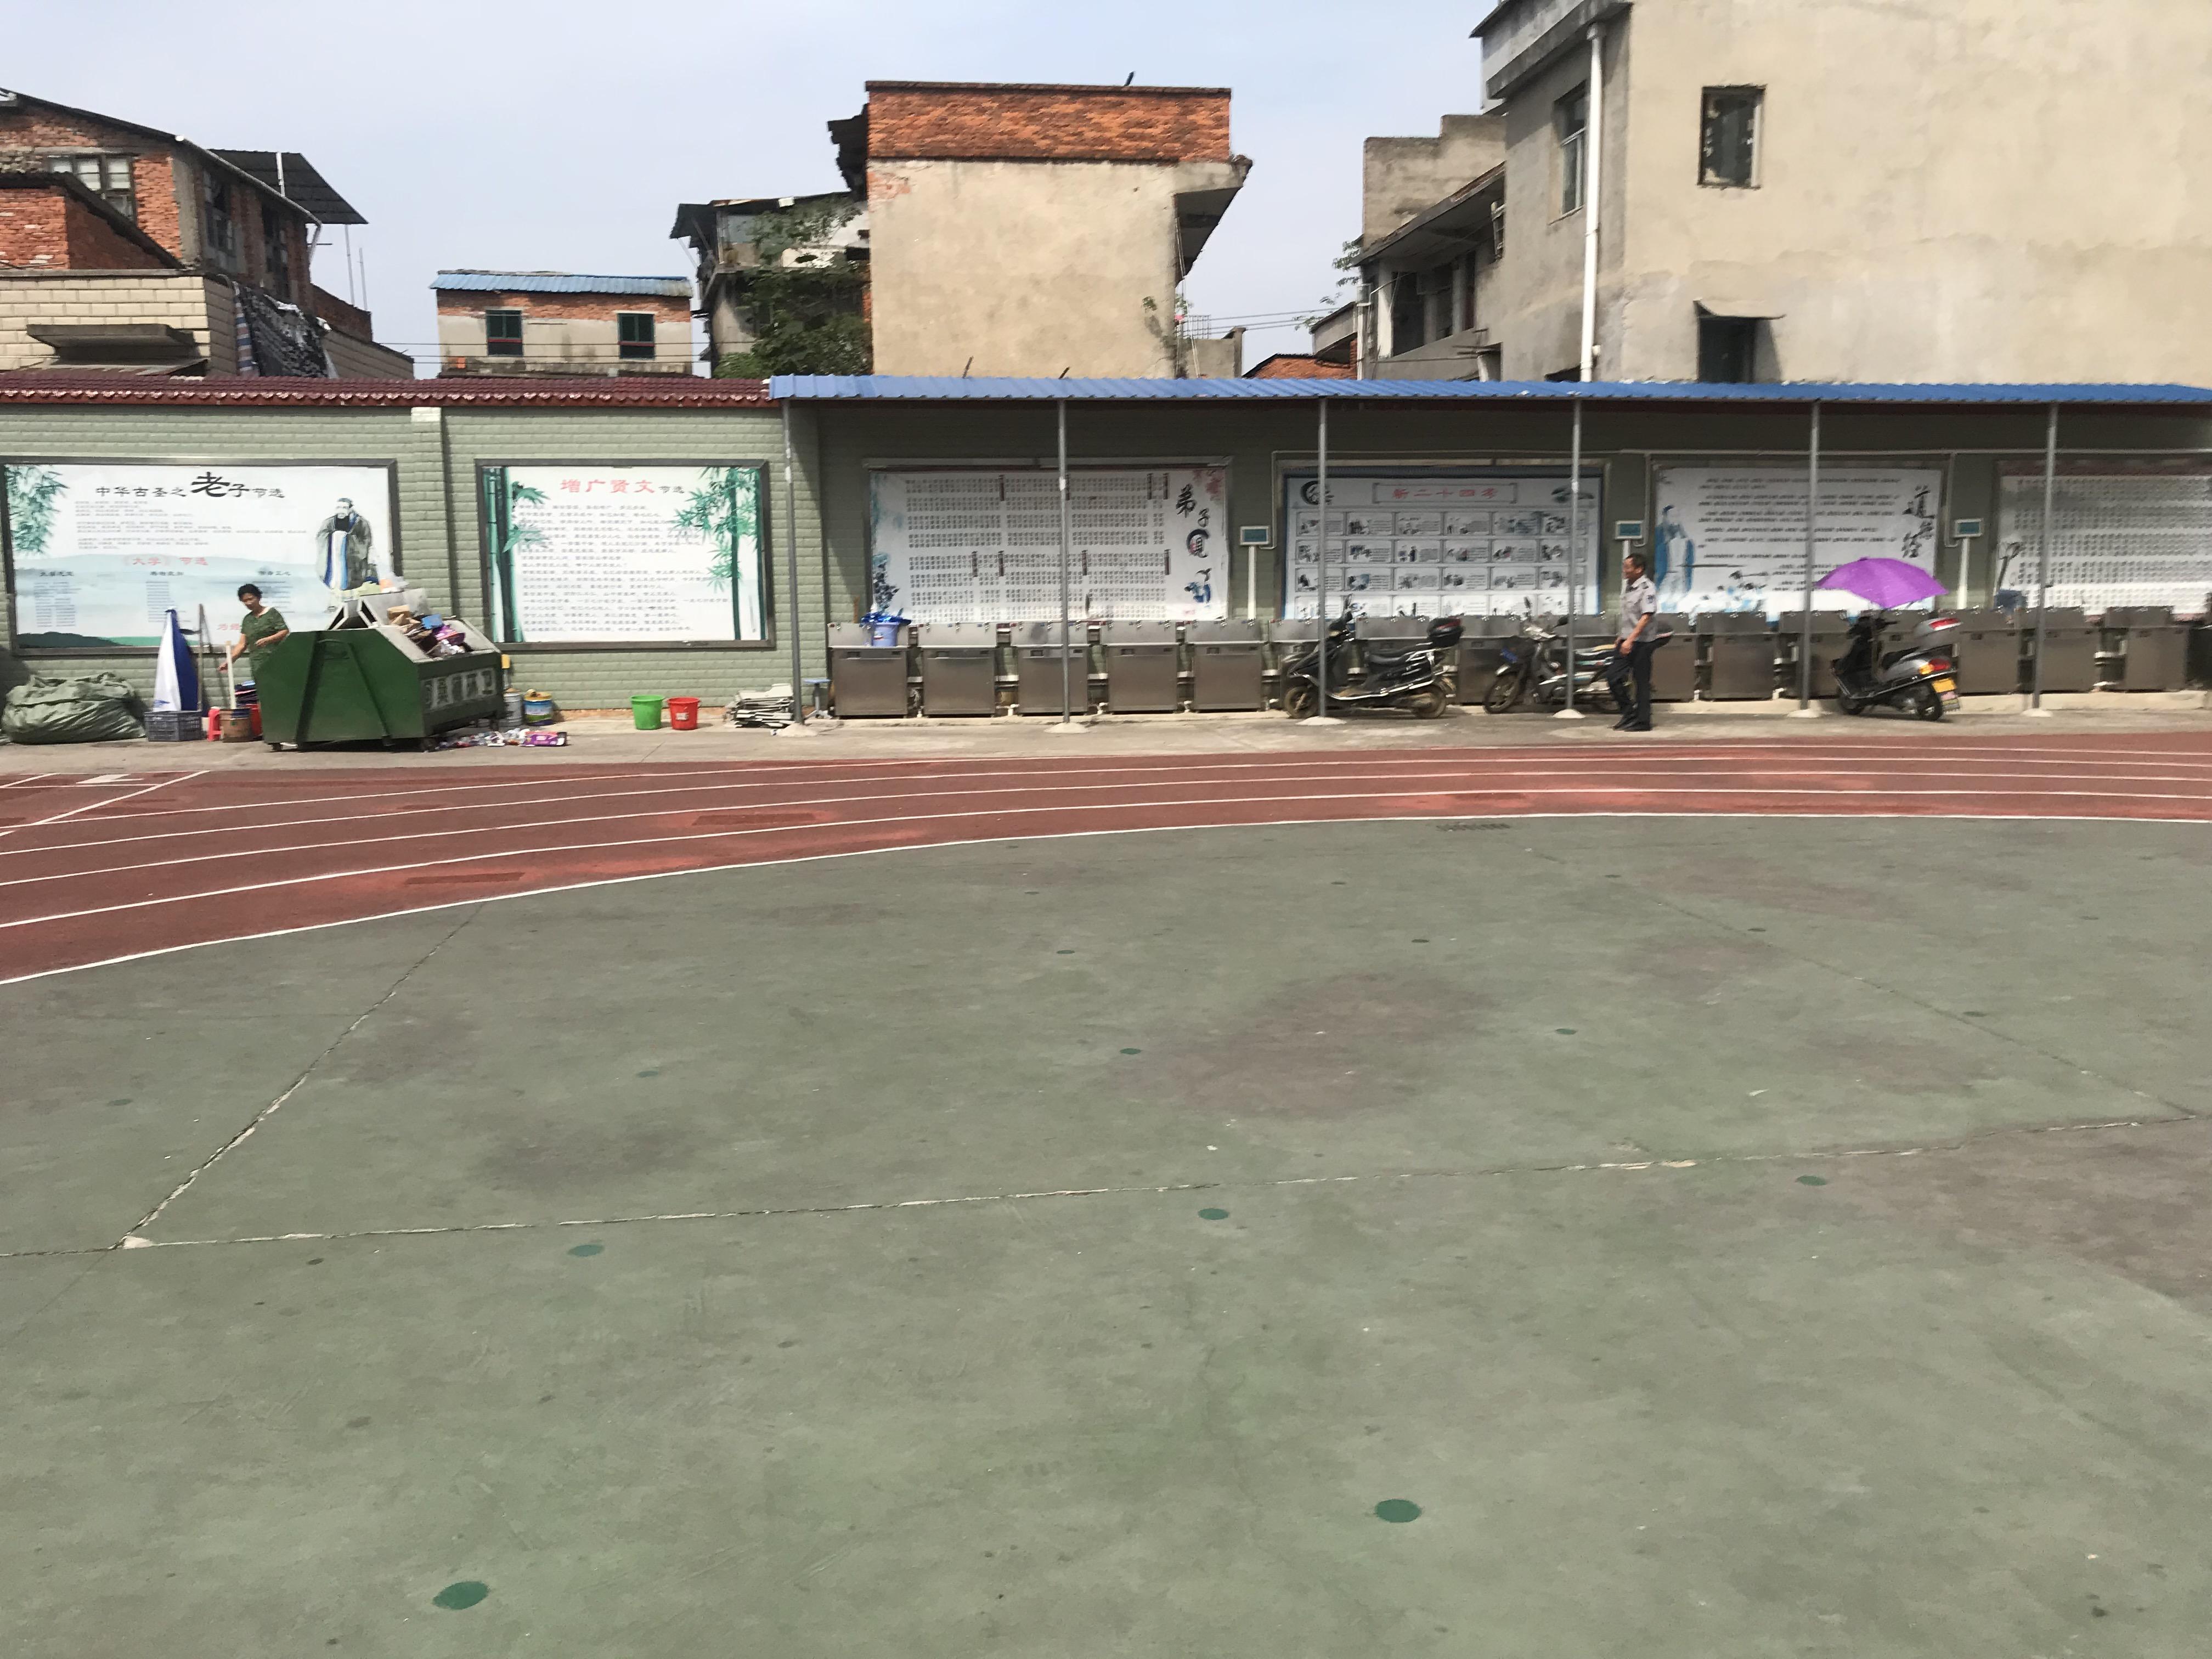 m6电竞市第二小学校园文化建设(图76)